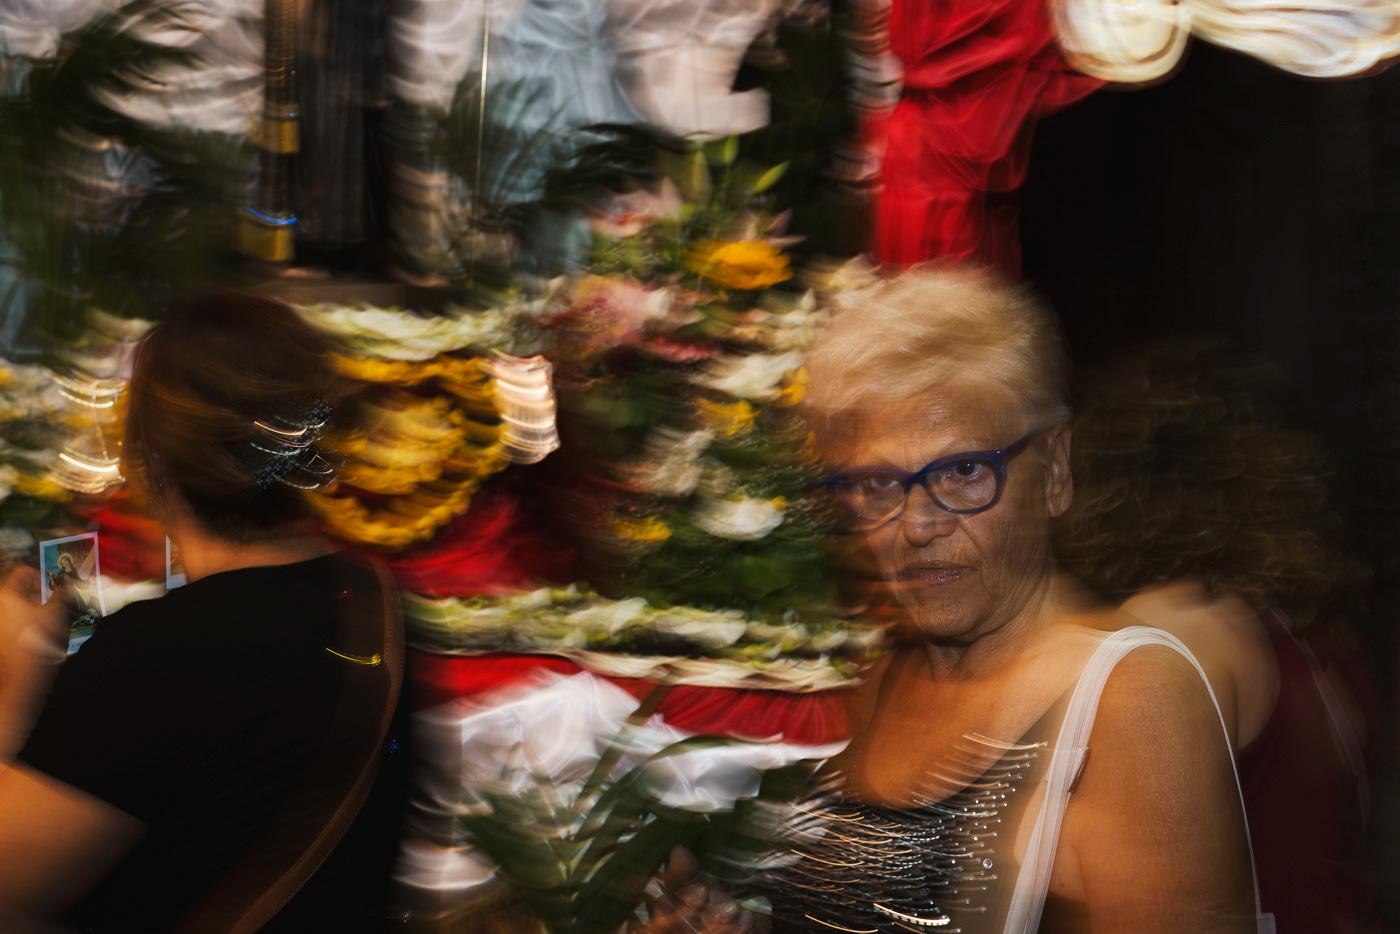 Santa Rosalia Palermo sicily festino santuzza street photography photograhy people festival culture